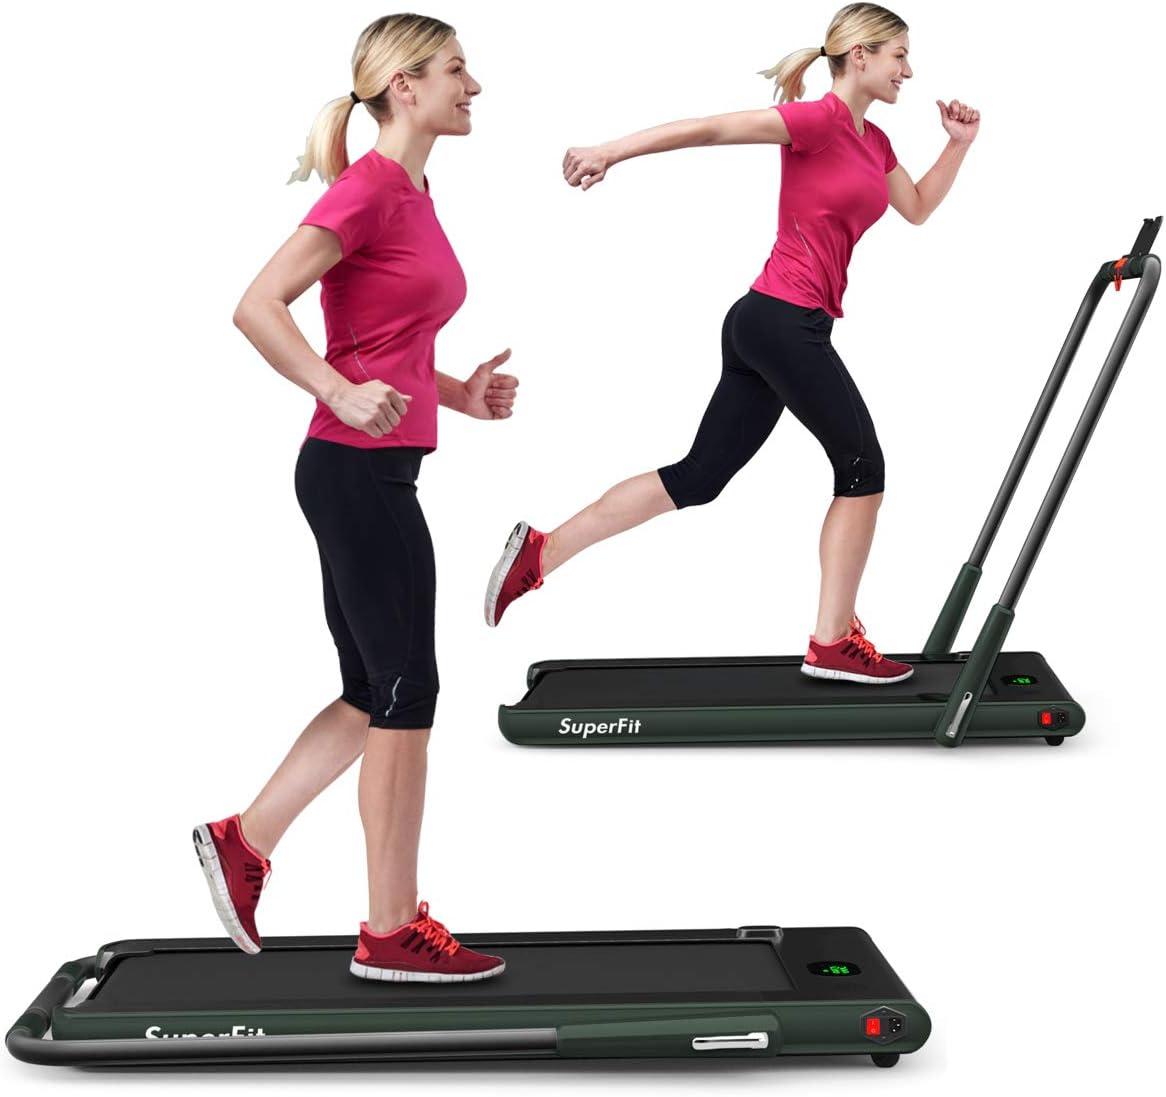 GYMAX 5 ☆ very popular Folding Treadmill 2 in 1 Mach Electric Max 55% OFF Desk Running Under